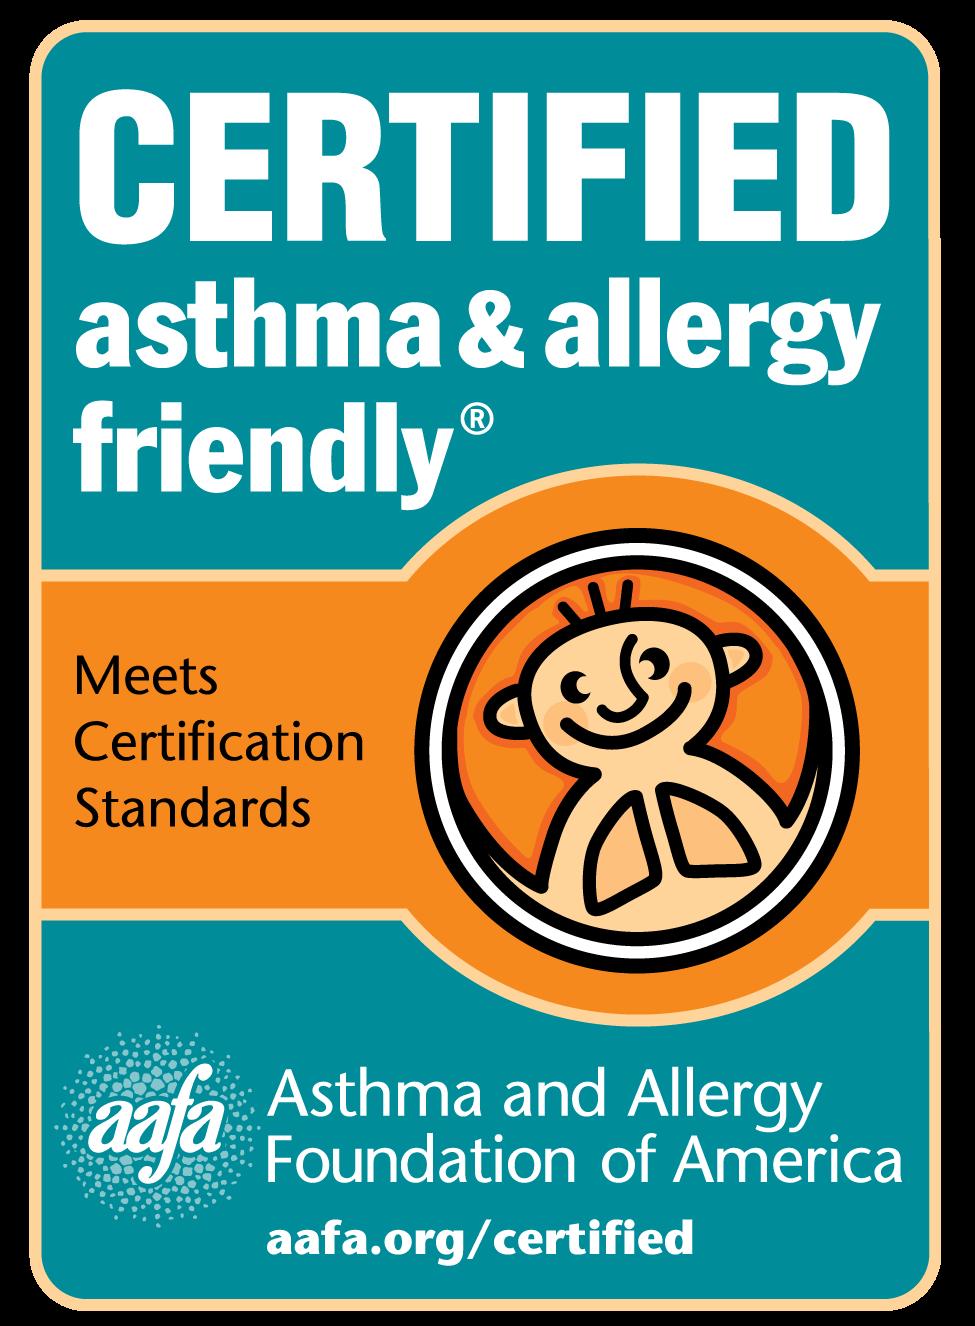 Certified Asthma & Allergy Friendly Logo